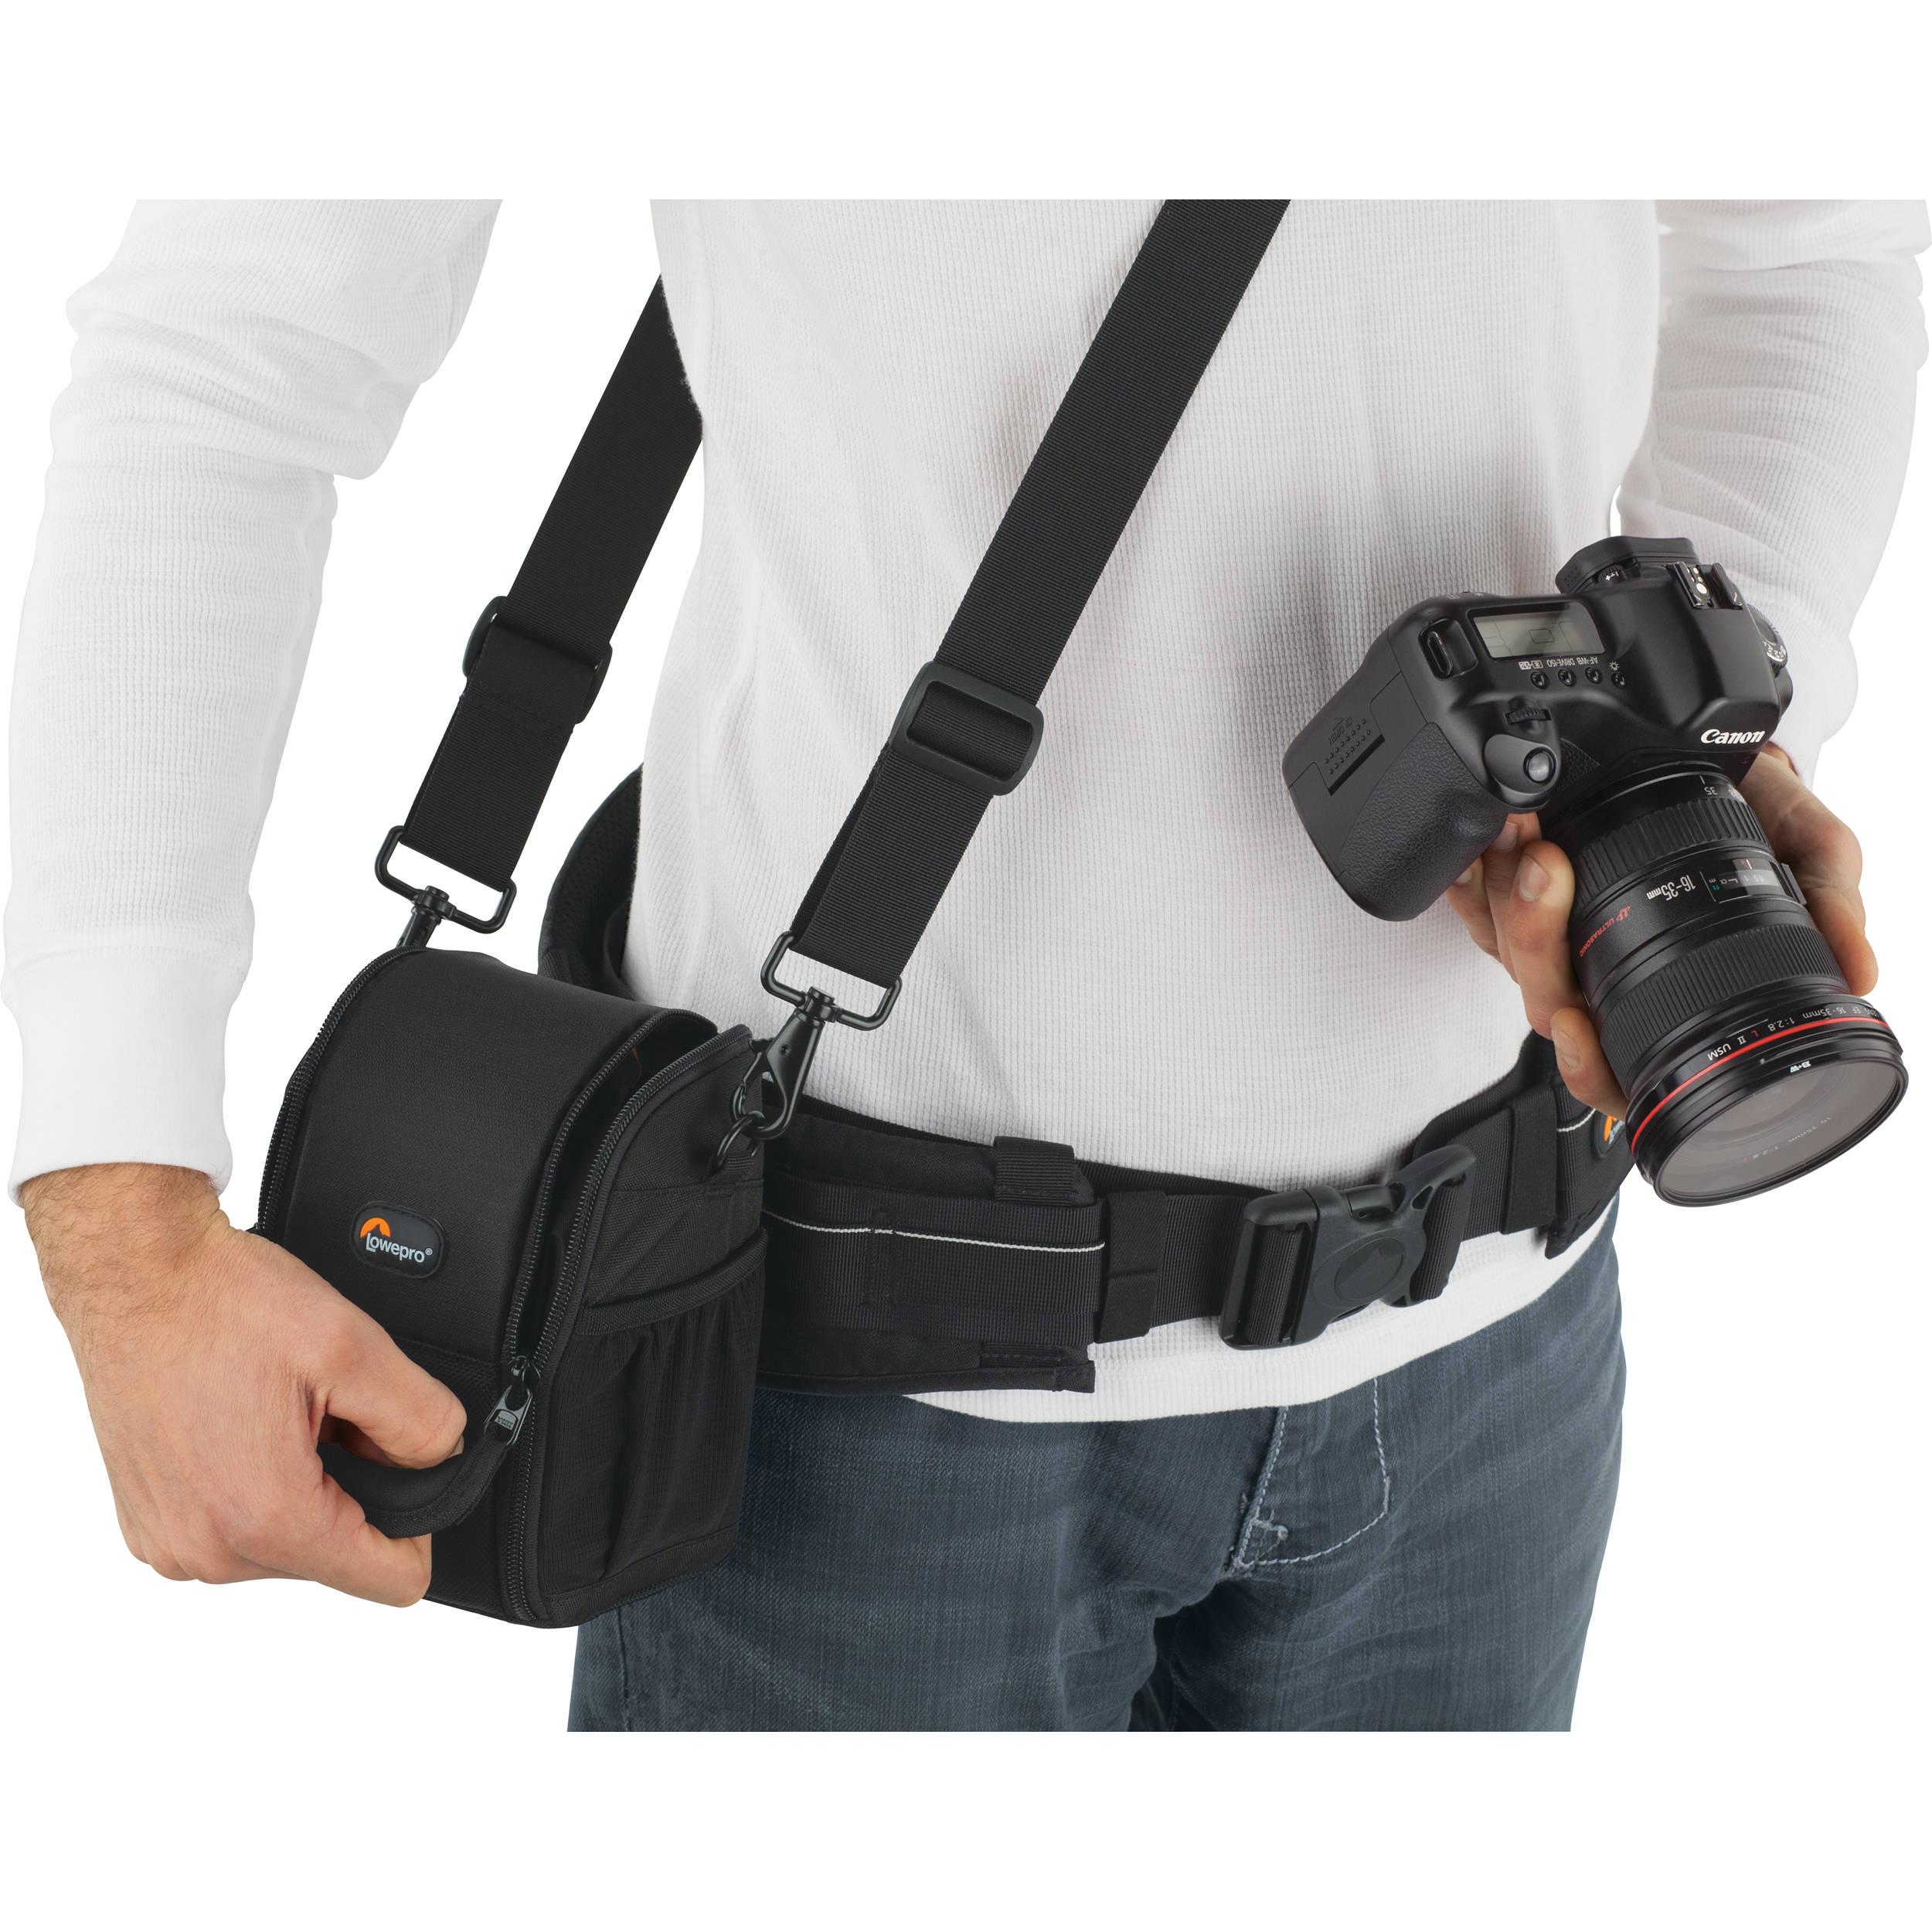 Lowepro S Amp F Lens Exchange Case 100 Aw Black Lp36446 B Amp H